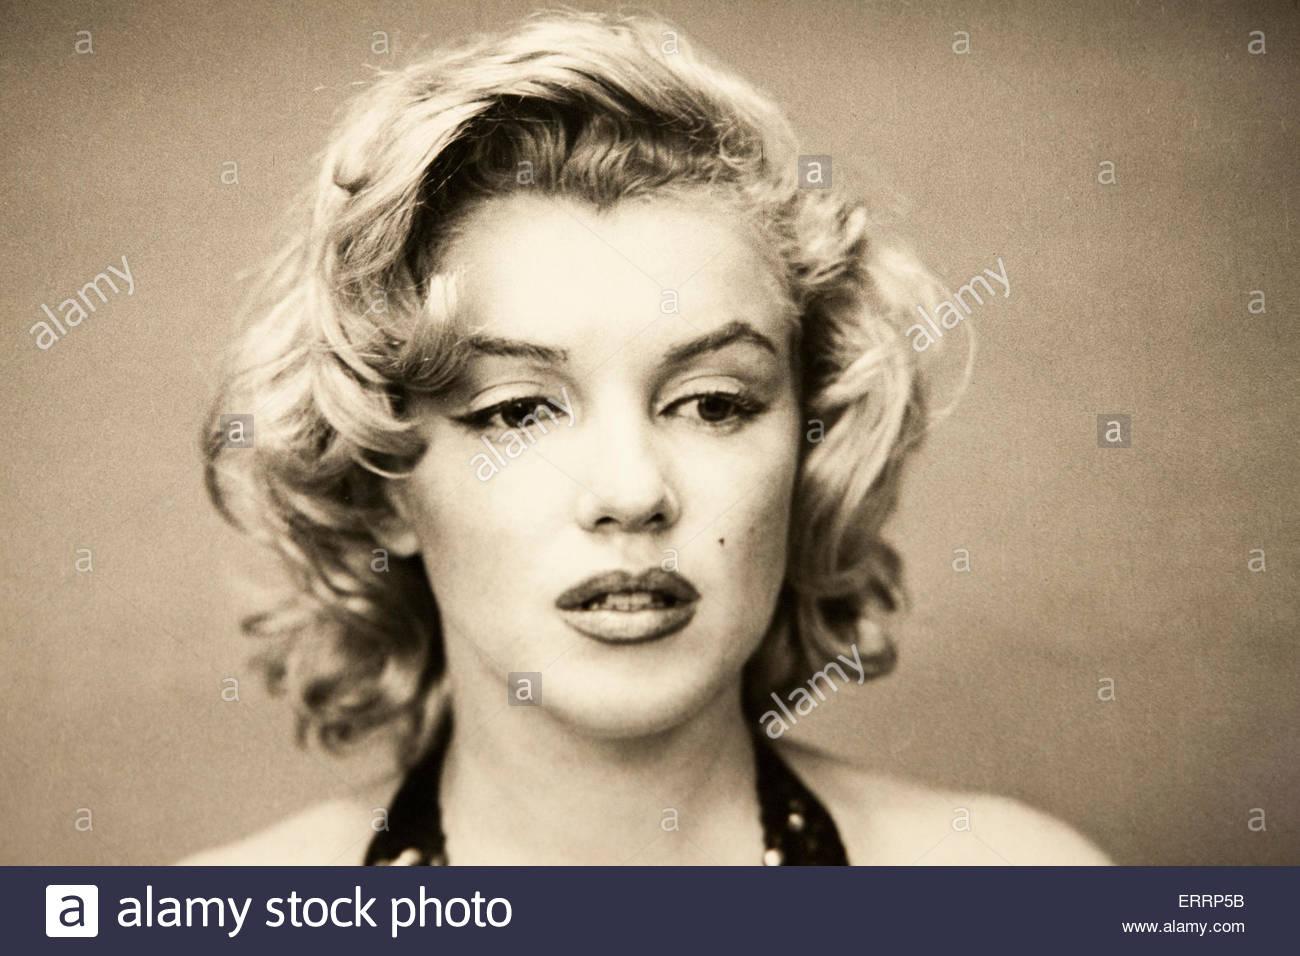 Marilyn Monroe Photograph, Metropolitan Museum of Art, Central Park, Manhattan, New York City - Stock Image